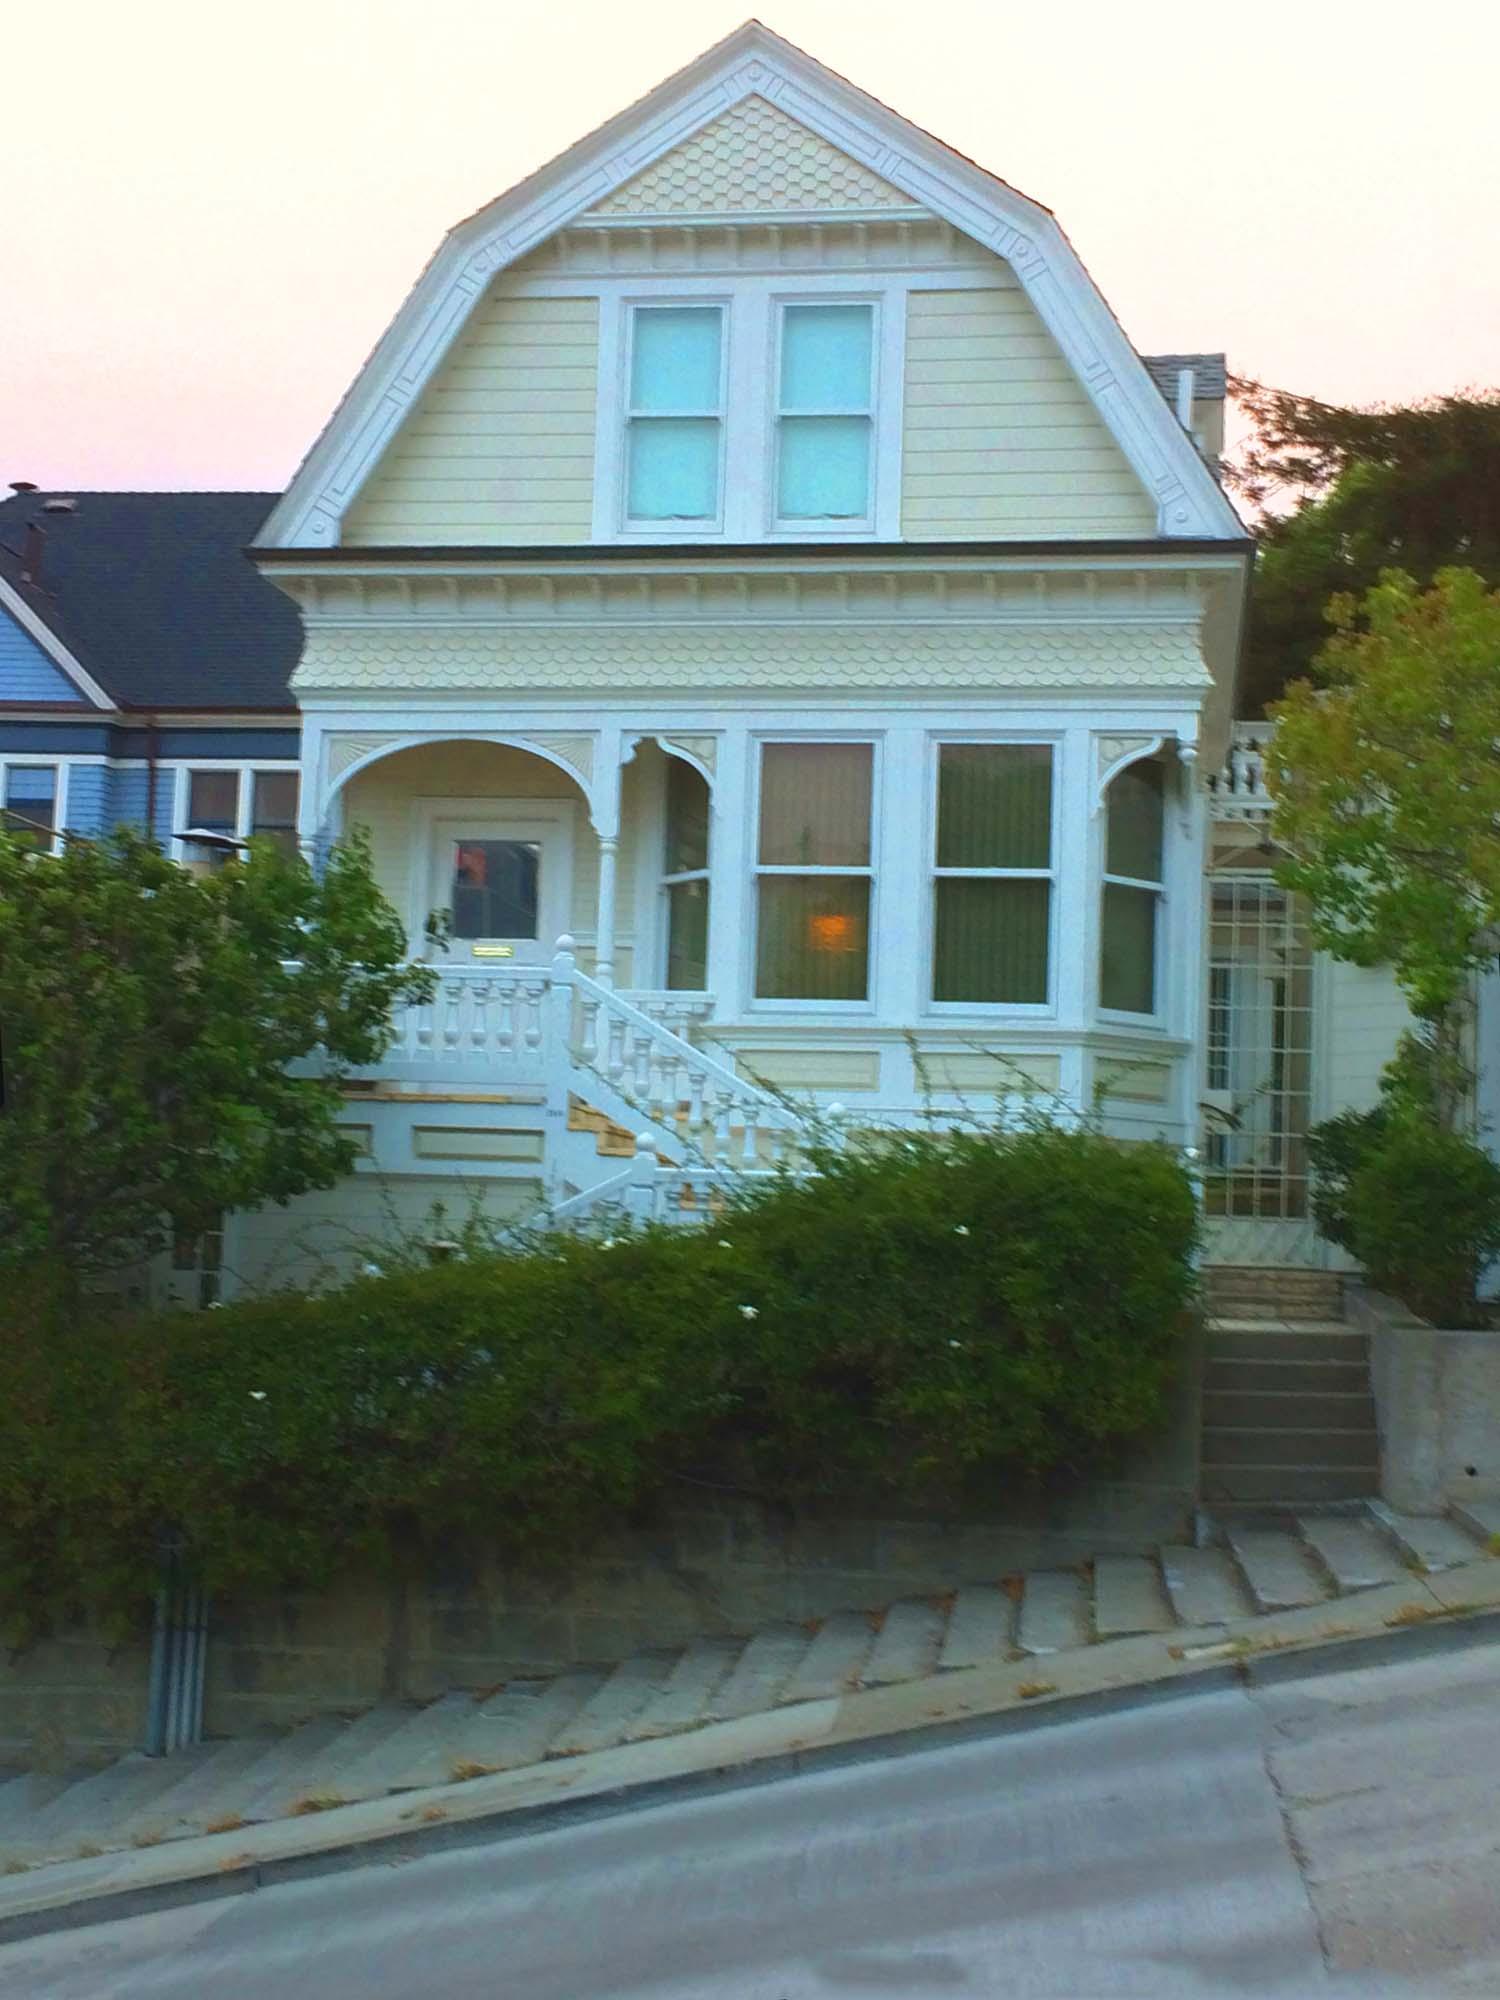 Pacific Heights, San Francisco, California | Image: Laura Messersmith